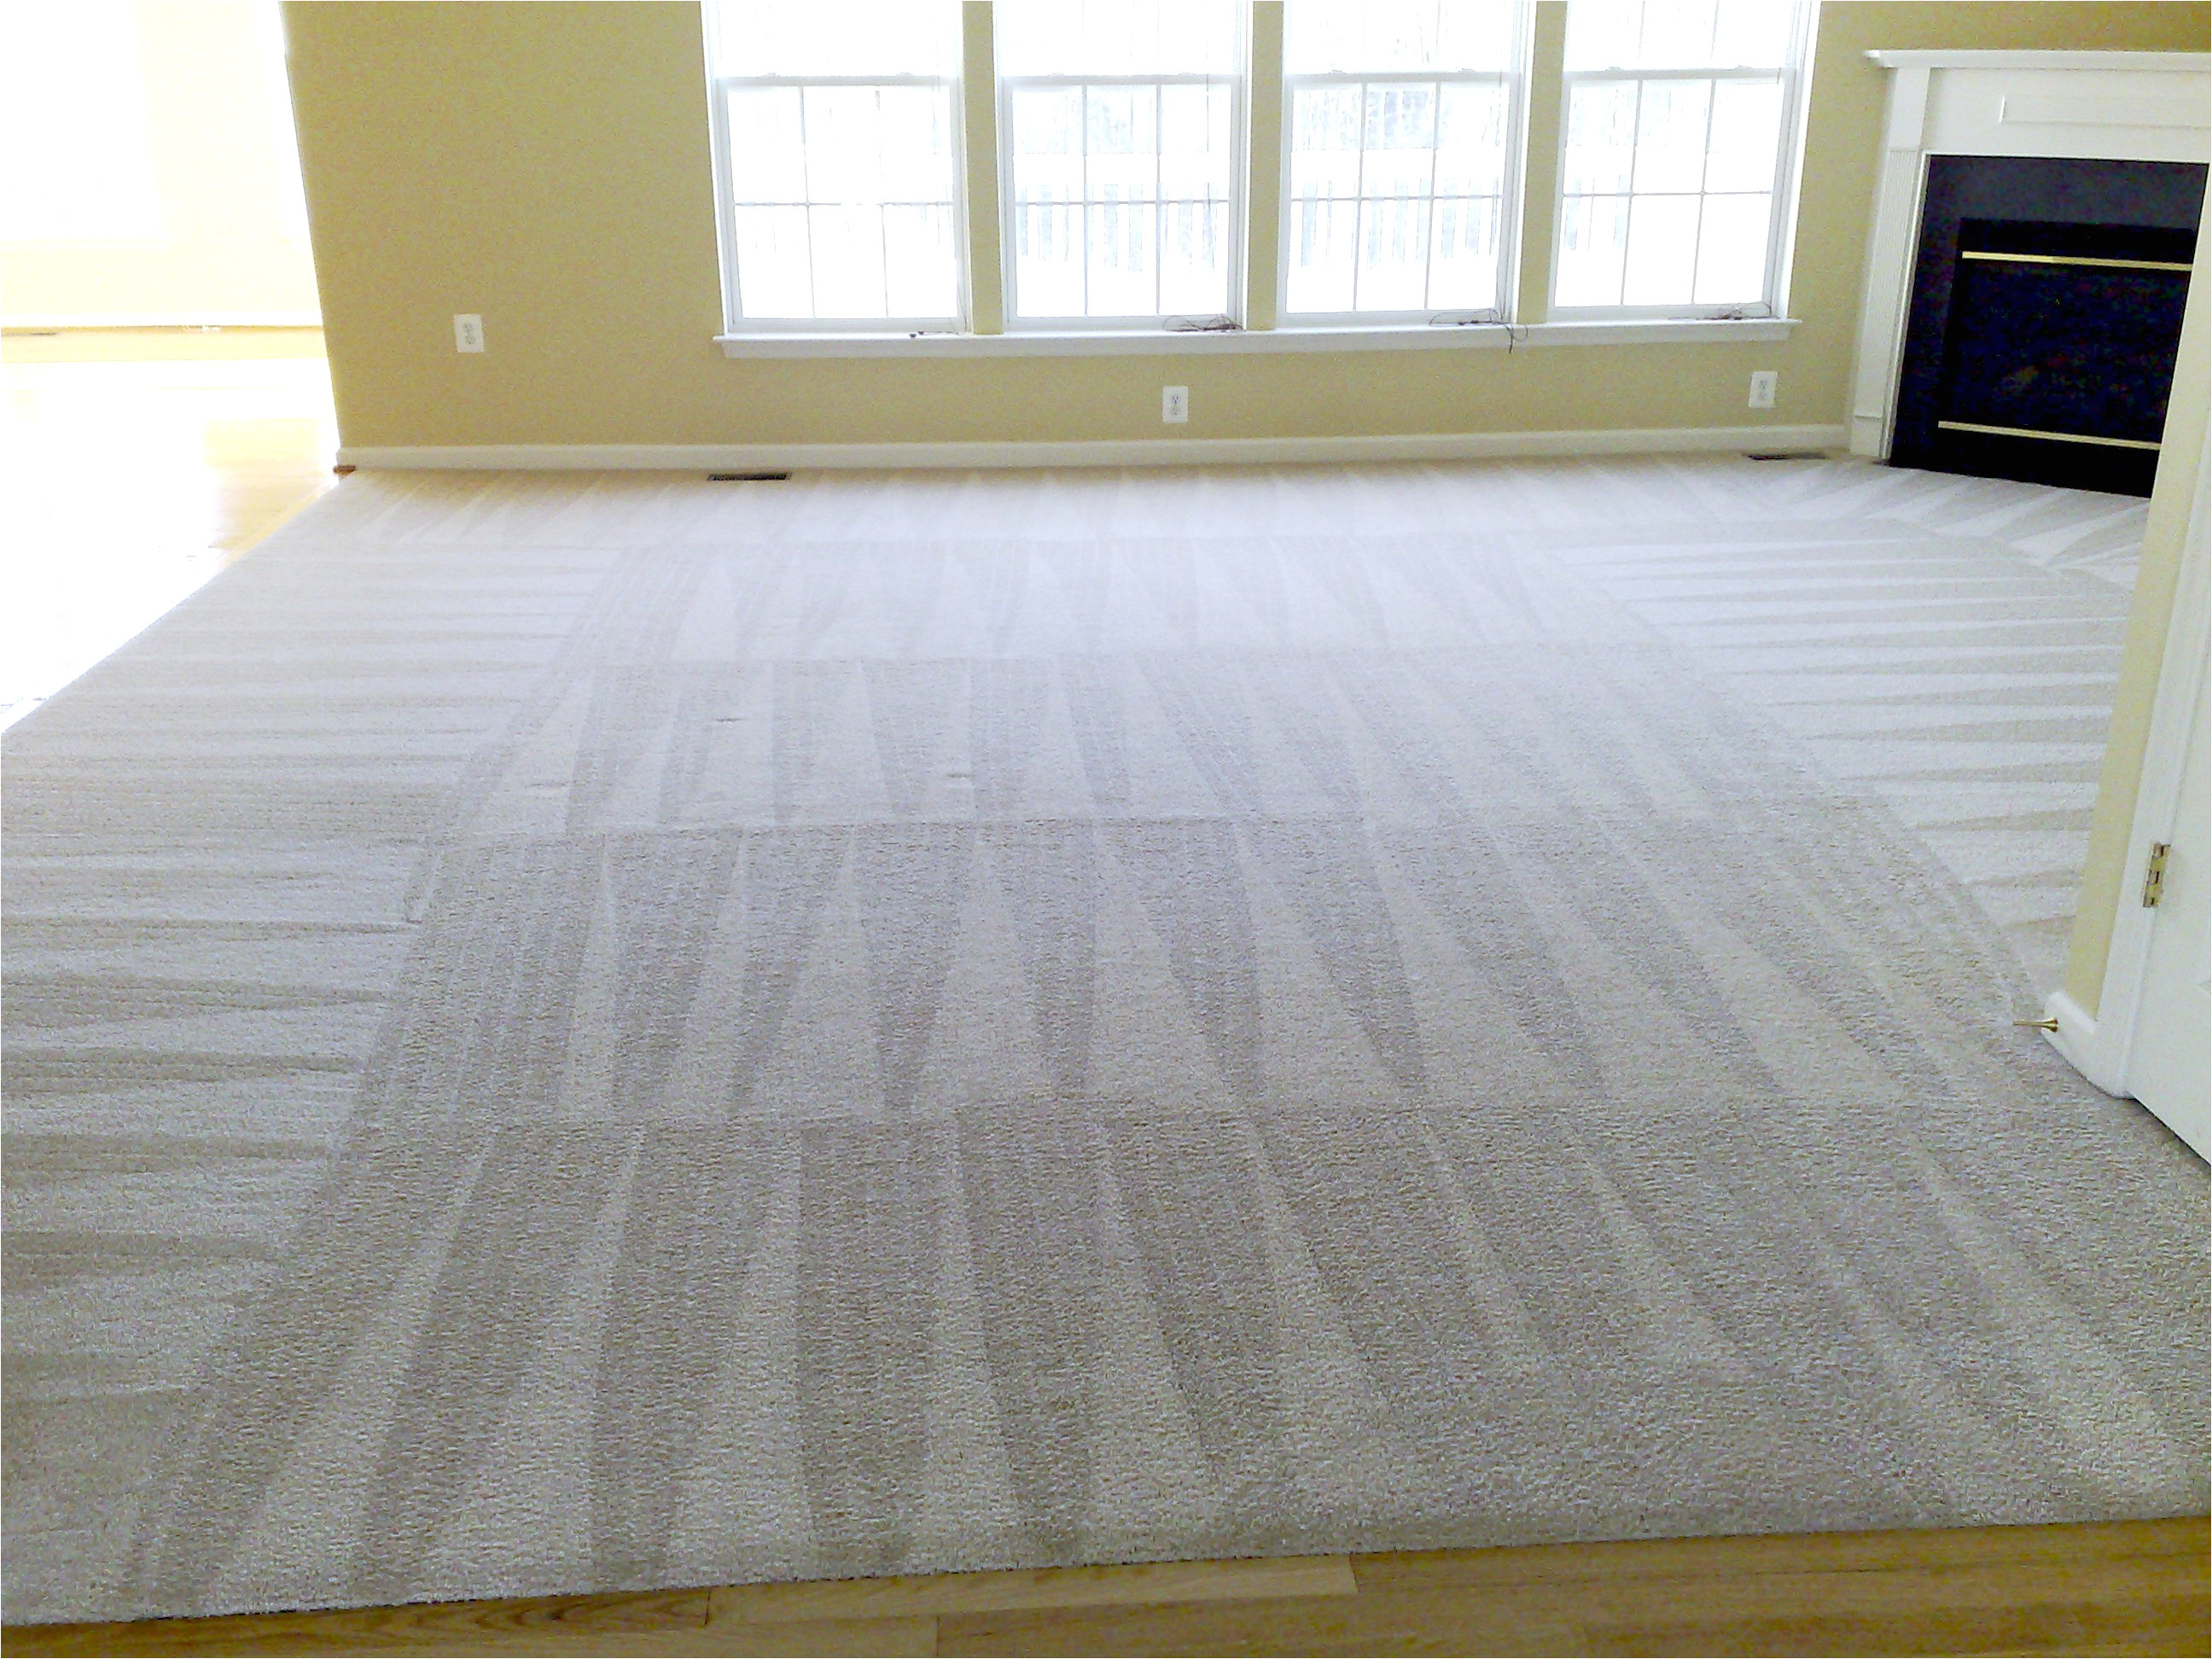 carpet cleaners stafford va fresh superior fabric cleaners fredericksburg carpet cleaners of carpet cleaners stafford va jpg